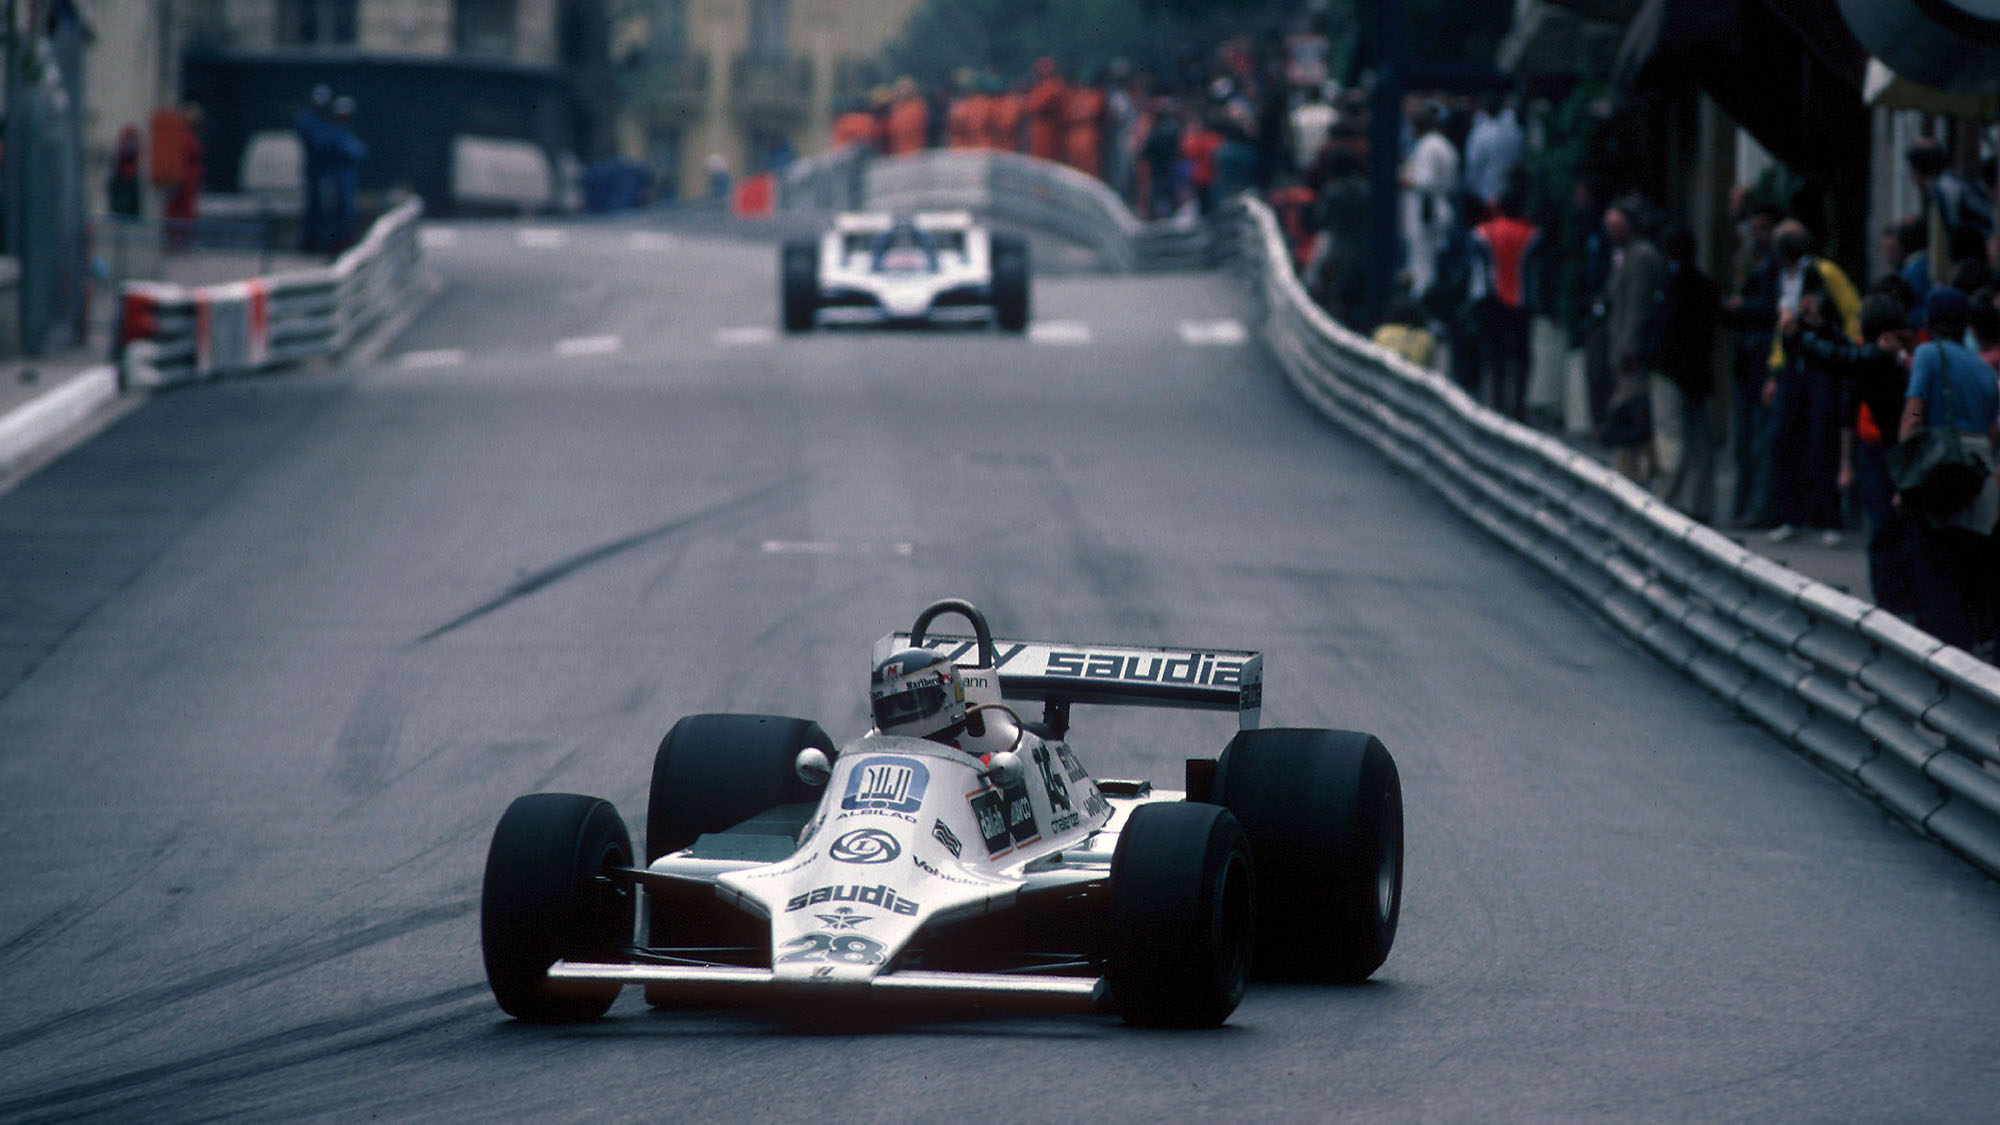 AUTO - F1 1980 - MONACO GP 800518 - PHOTO: DPPI CARLOS REUTEMANN (ARG) / WILLIAMS FORD - ACTION